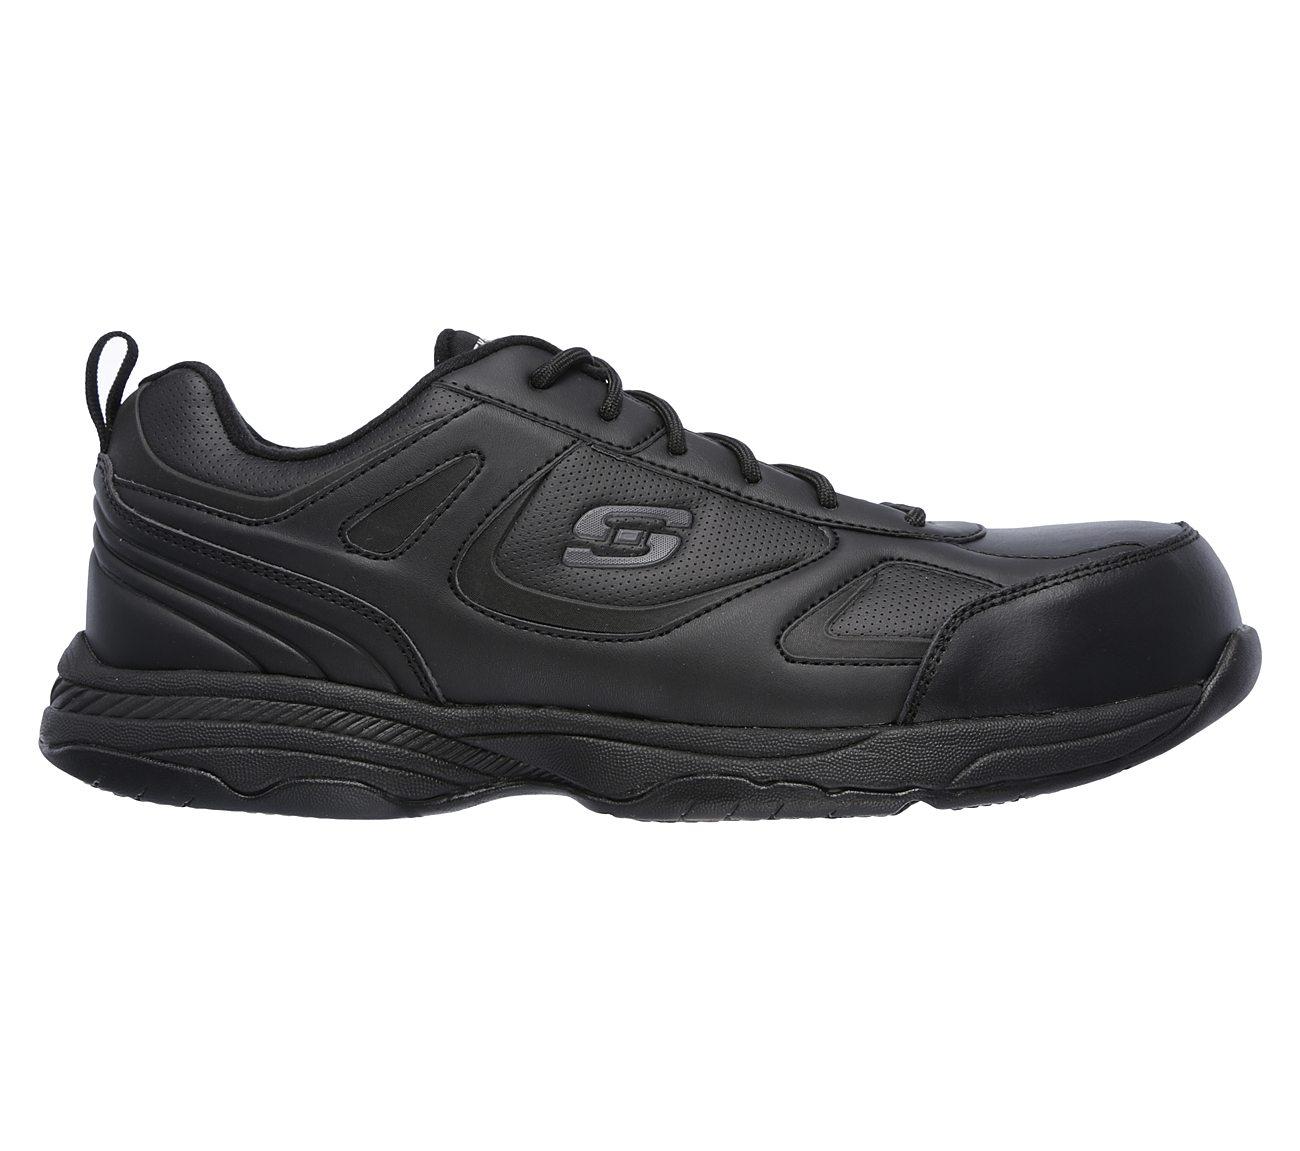 Skechers Slip Resistant Shoes Mens Dsw